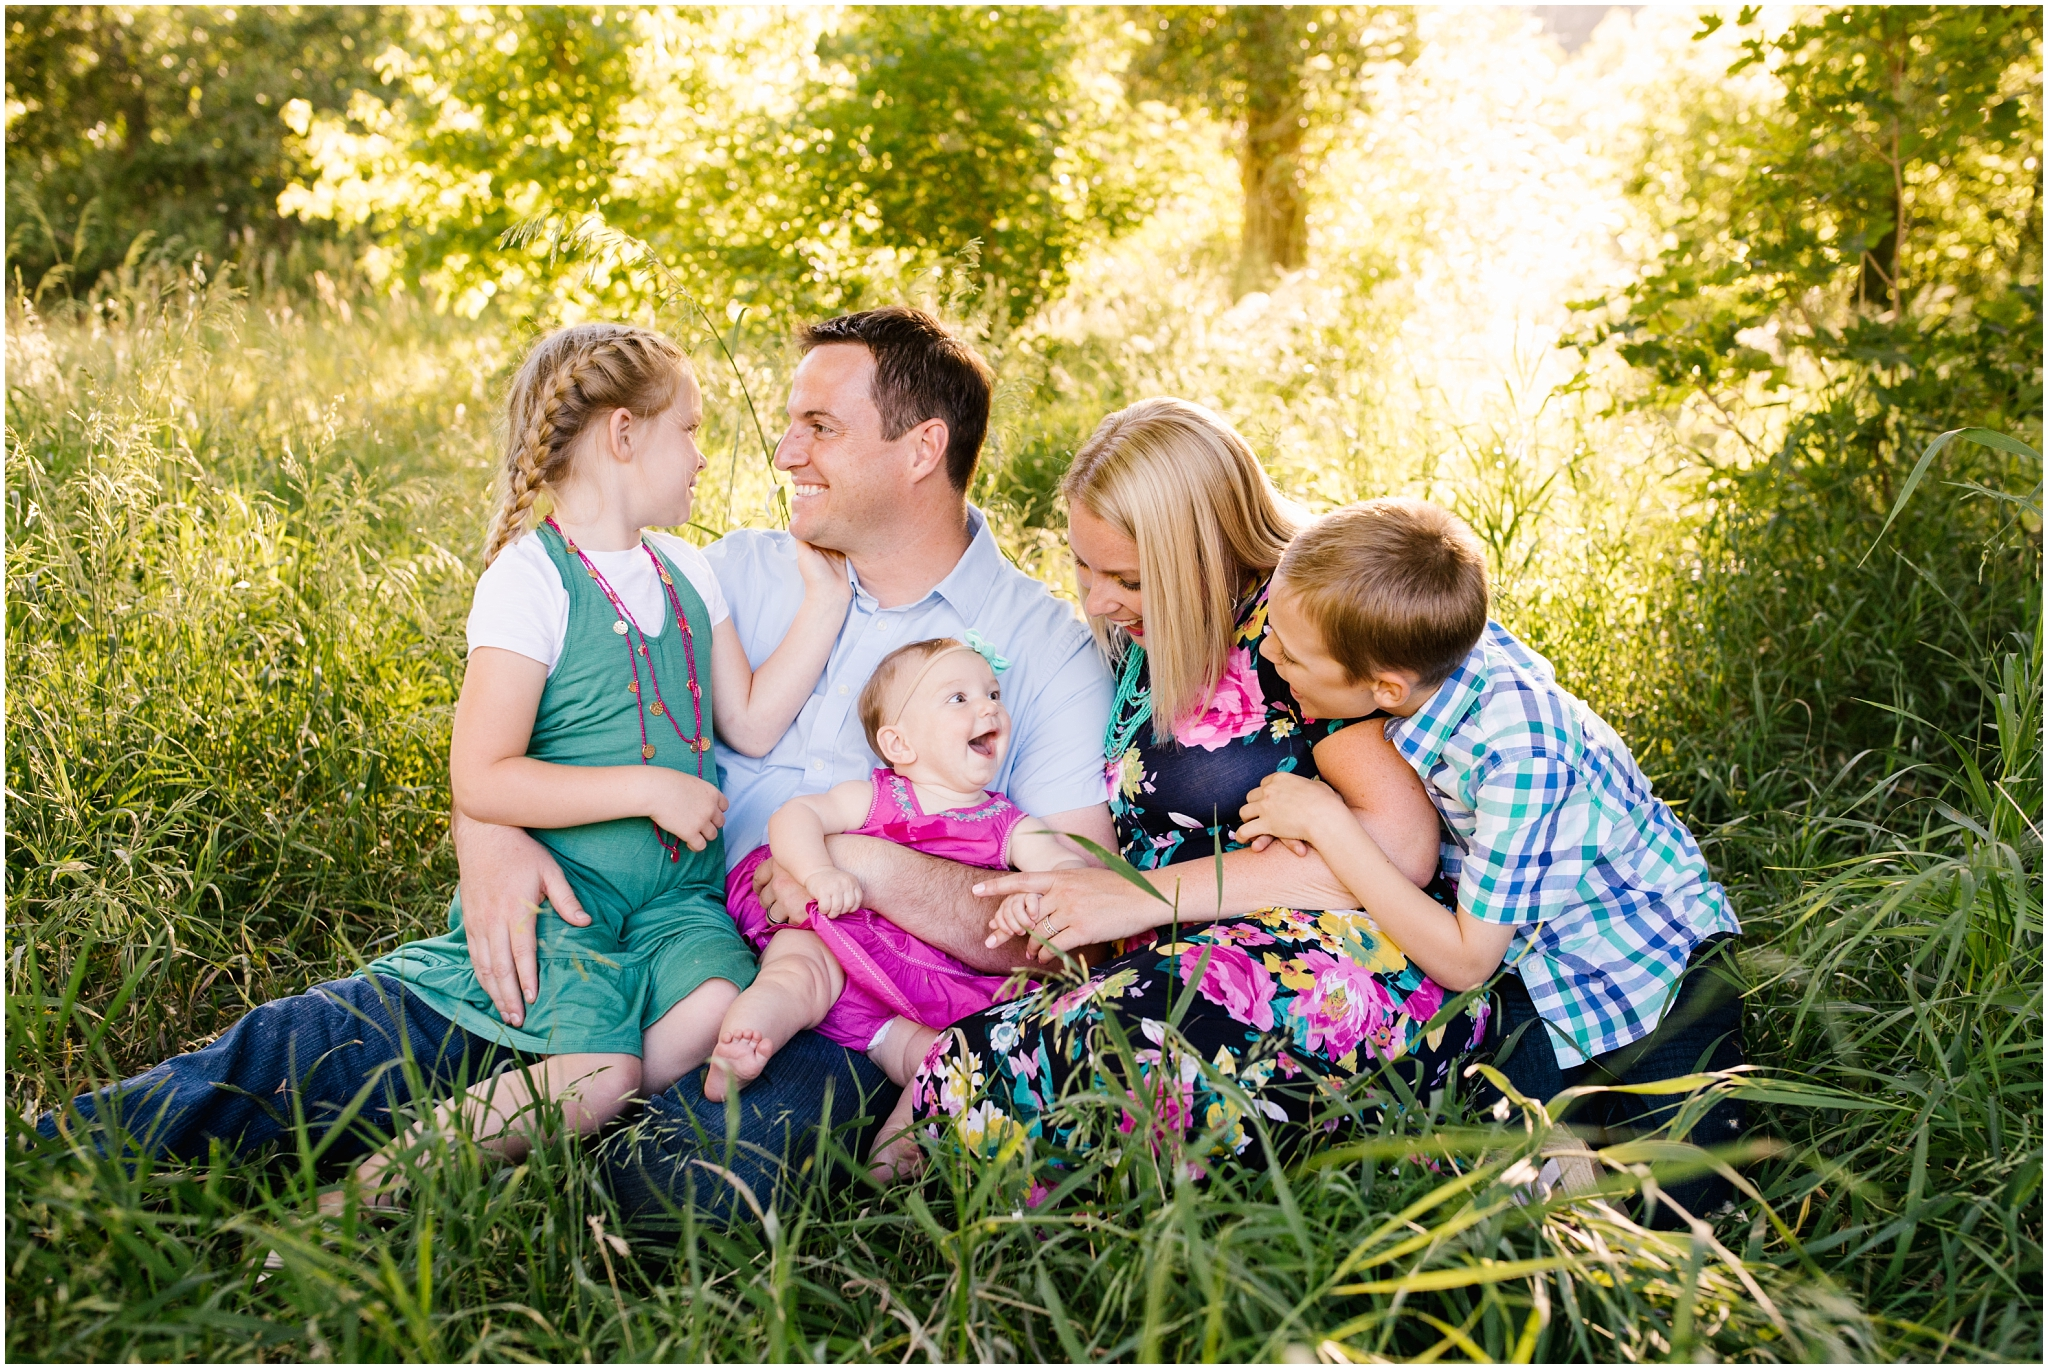 Lizzie-B-Imagery-Utah-Family-Photographer-Utah-County-Photographer-Hobble-Creek-Canyon_0001.jpg